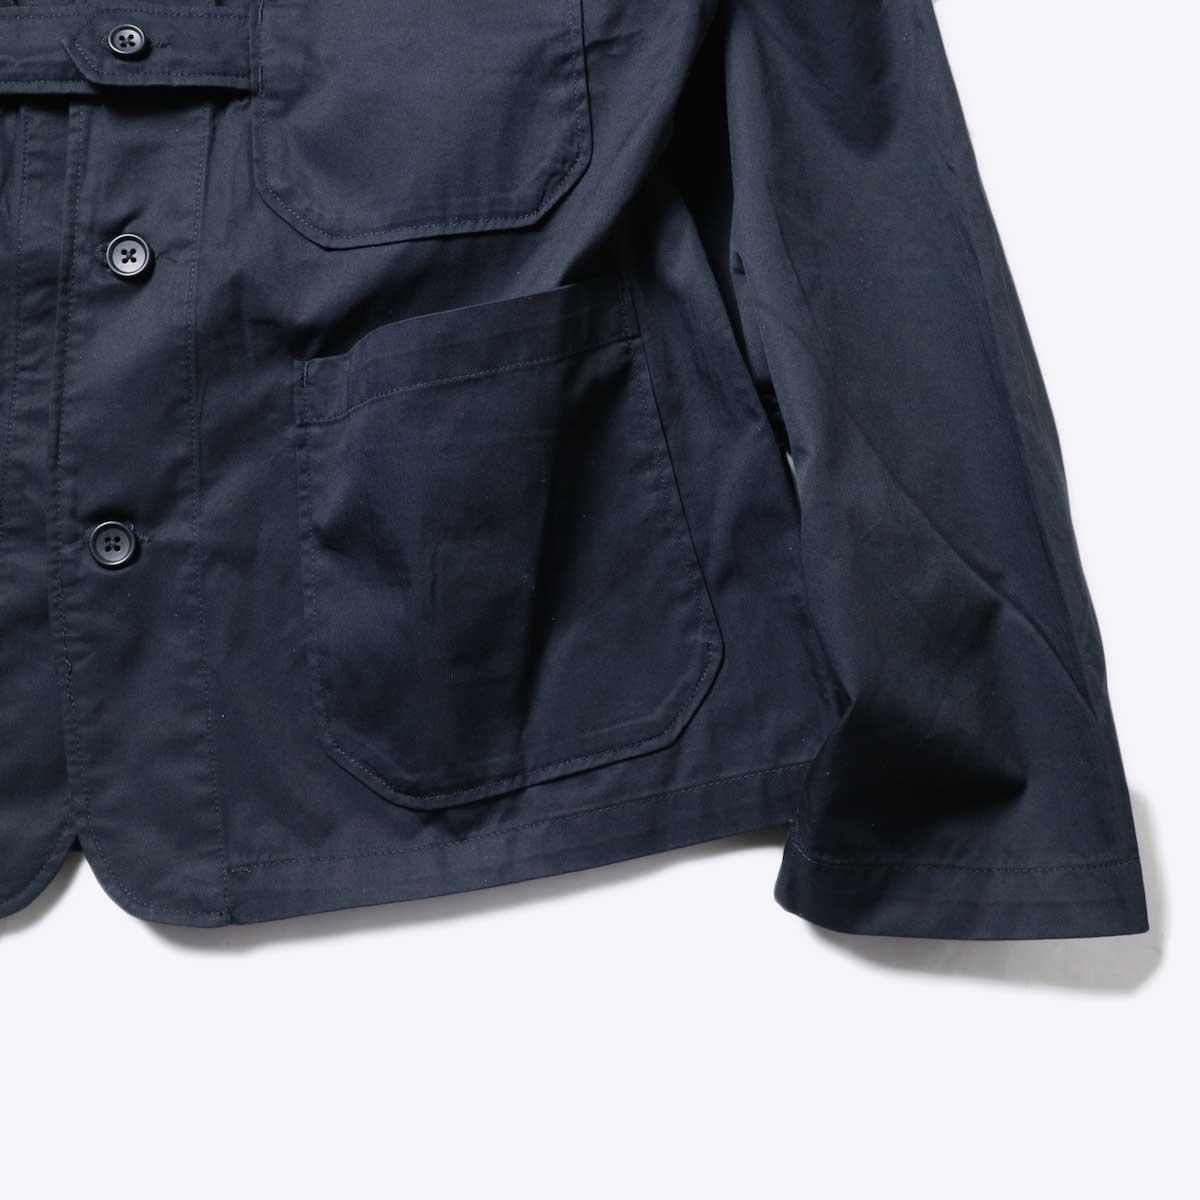 Engineered Garments / Cardigan Jacket -High Count Twill (Black)袖、裾